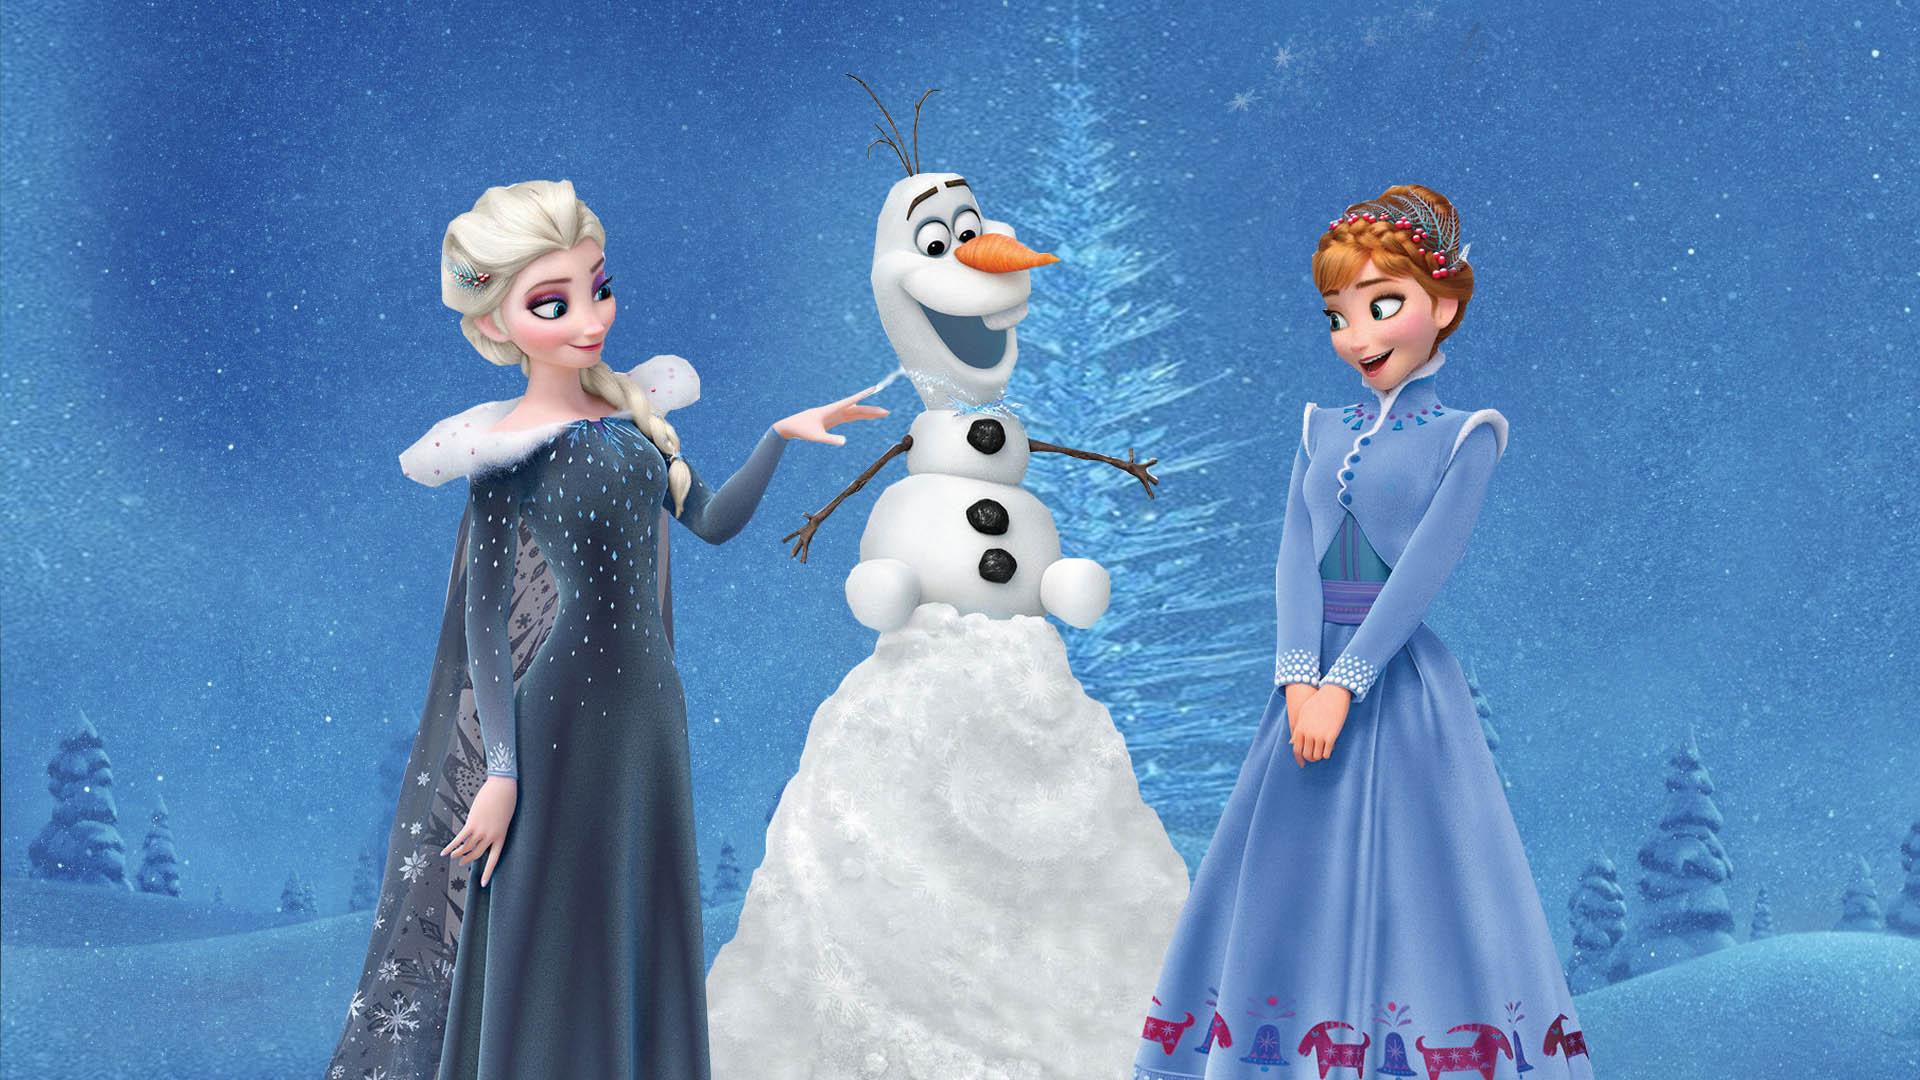 Wallpaper 4k Olafs Frozen Adventure Anna Elsa Adventure Anna